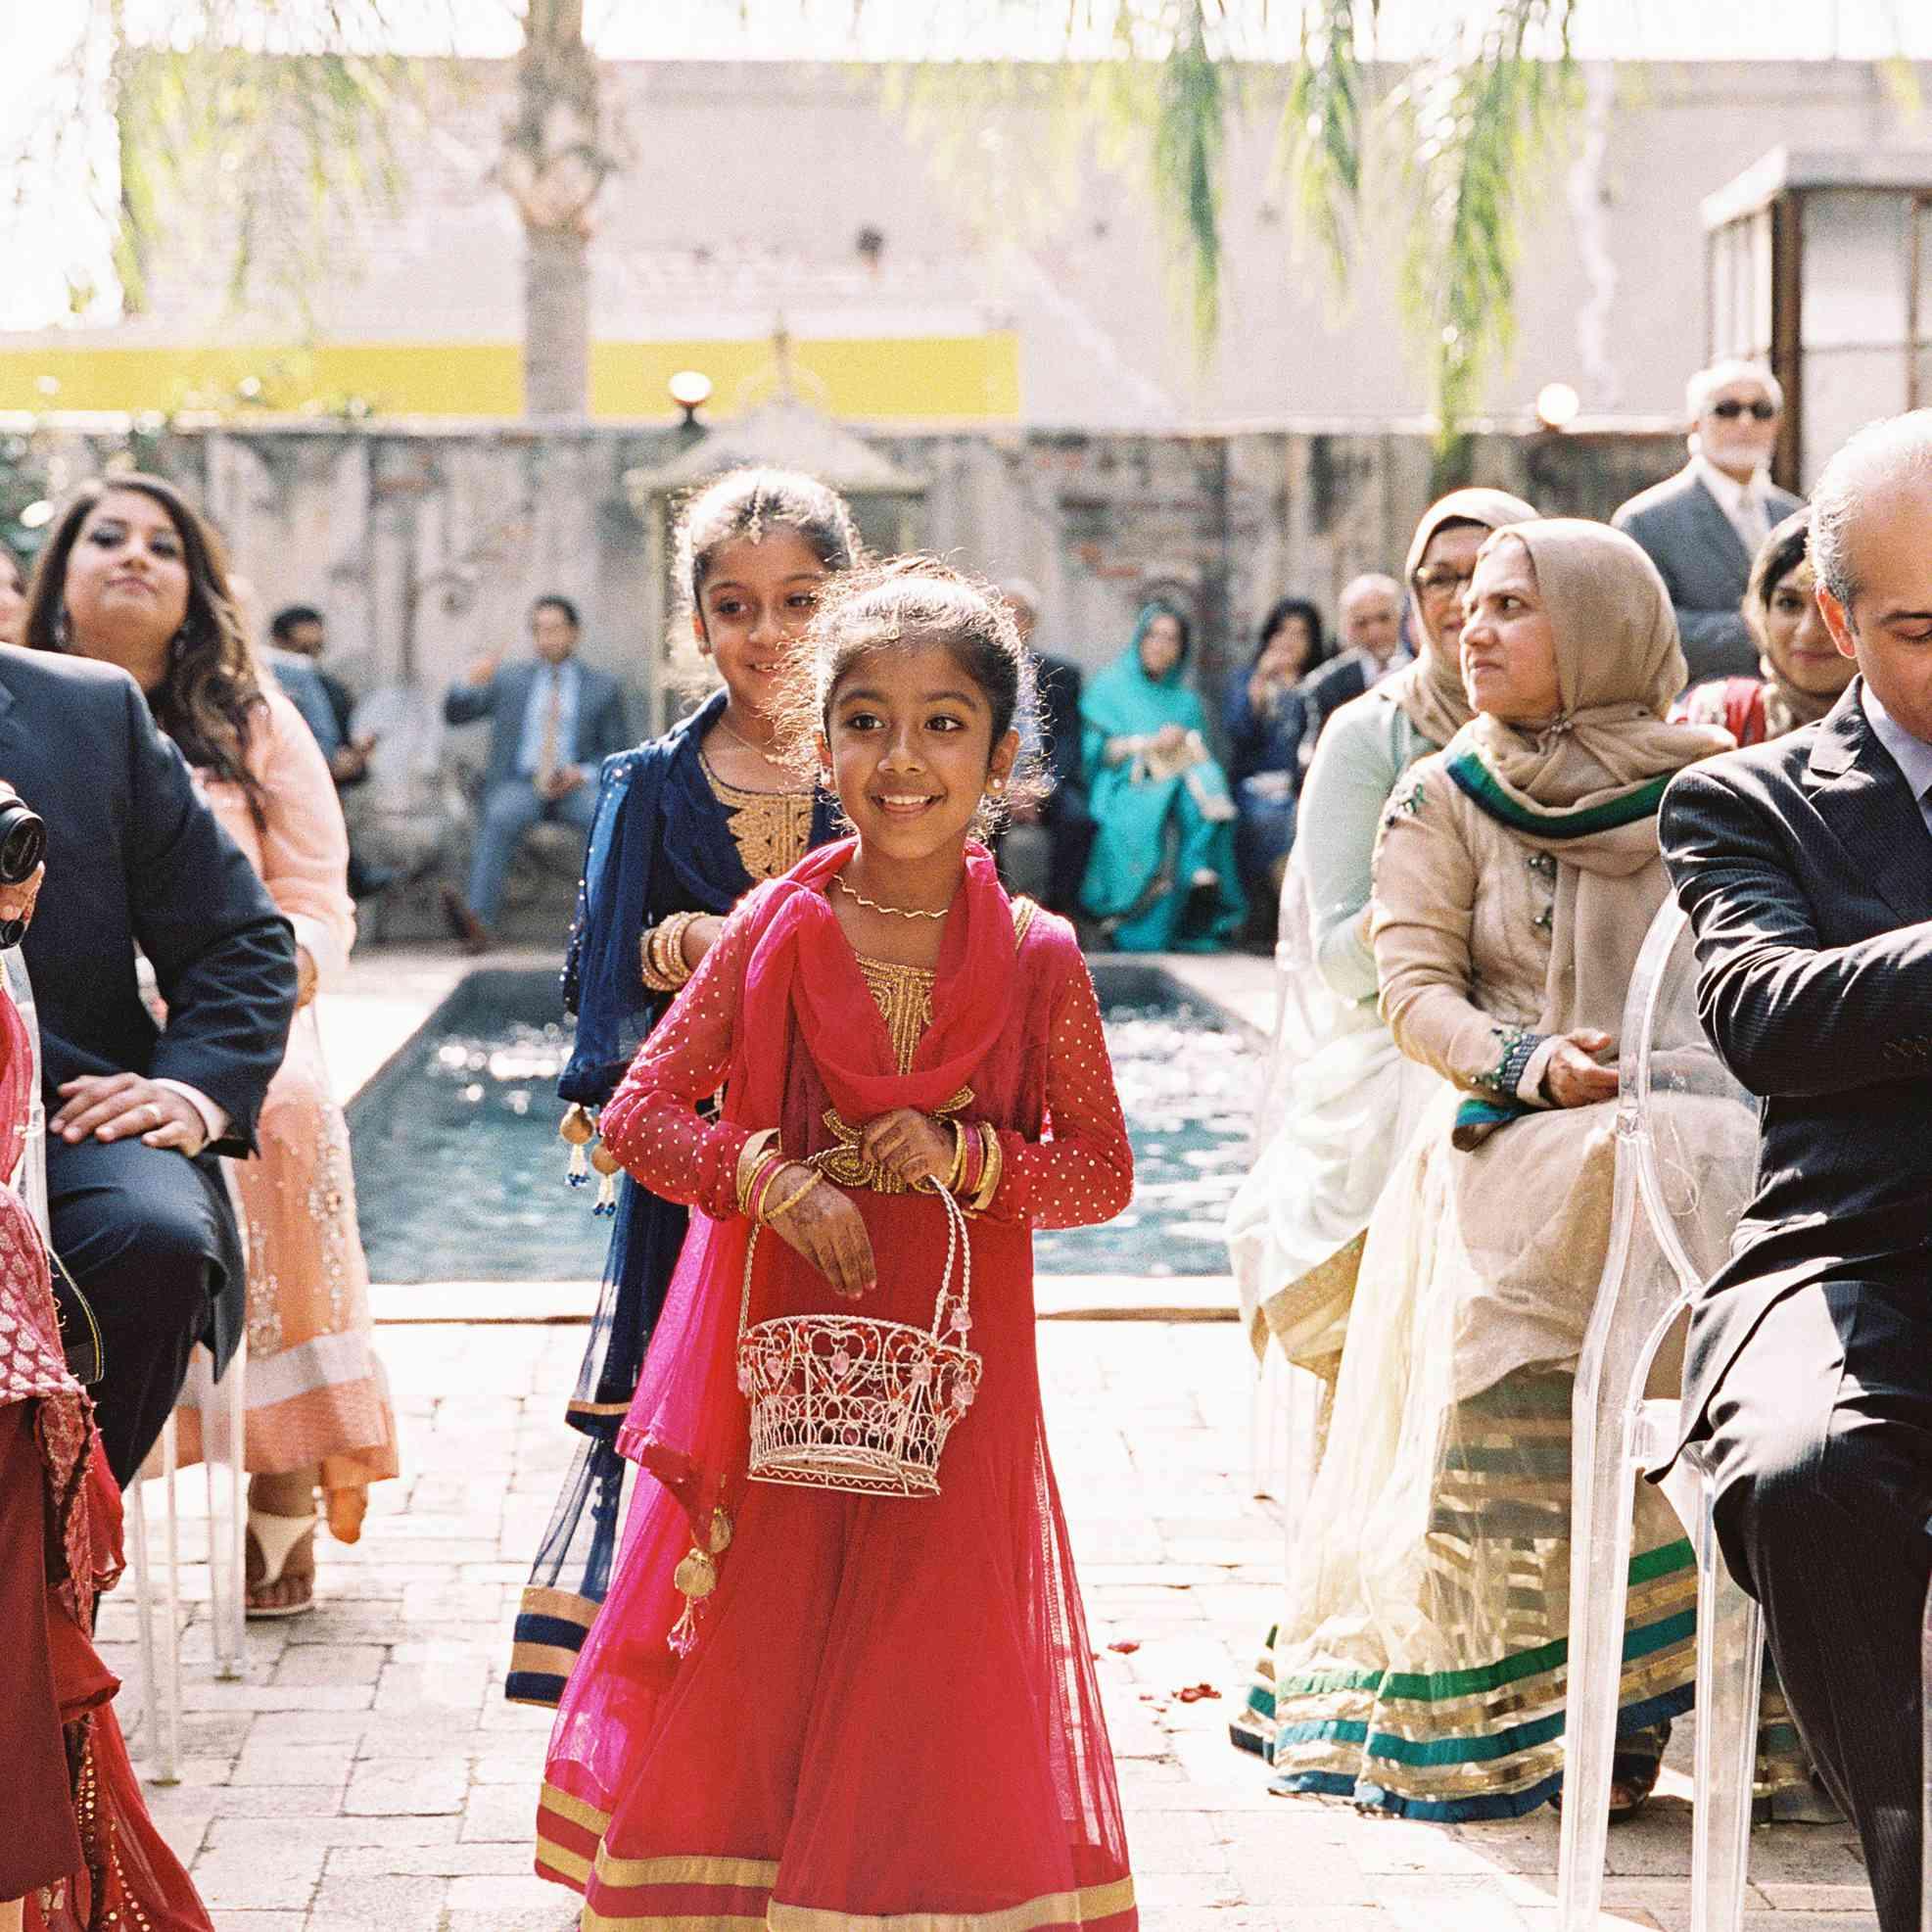 Flower Girl at Indian Wedding